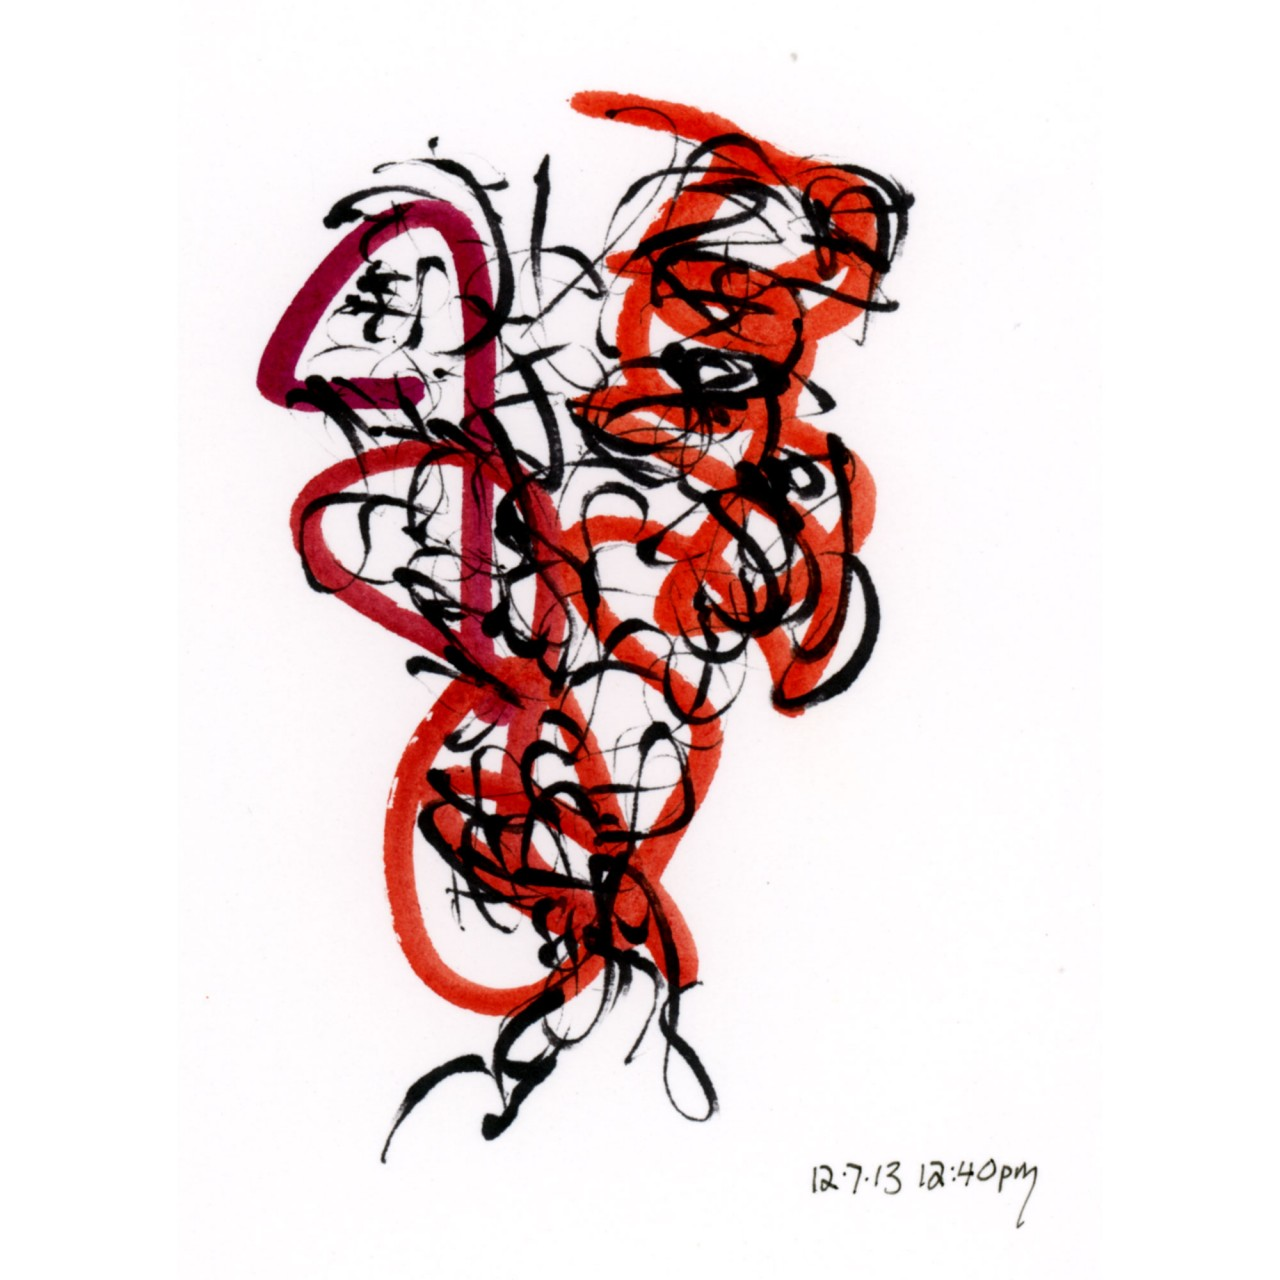 2013-12-07_12-40pm001